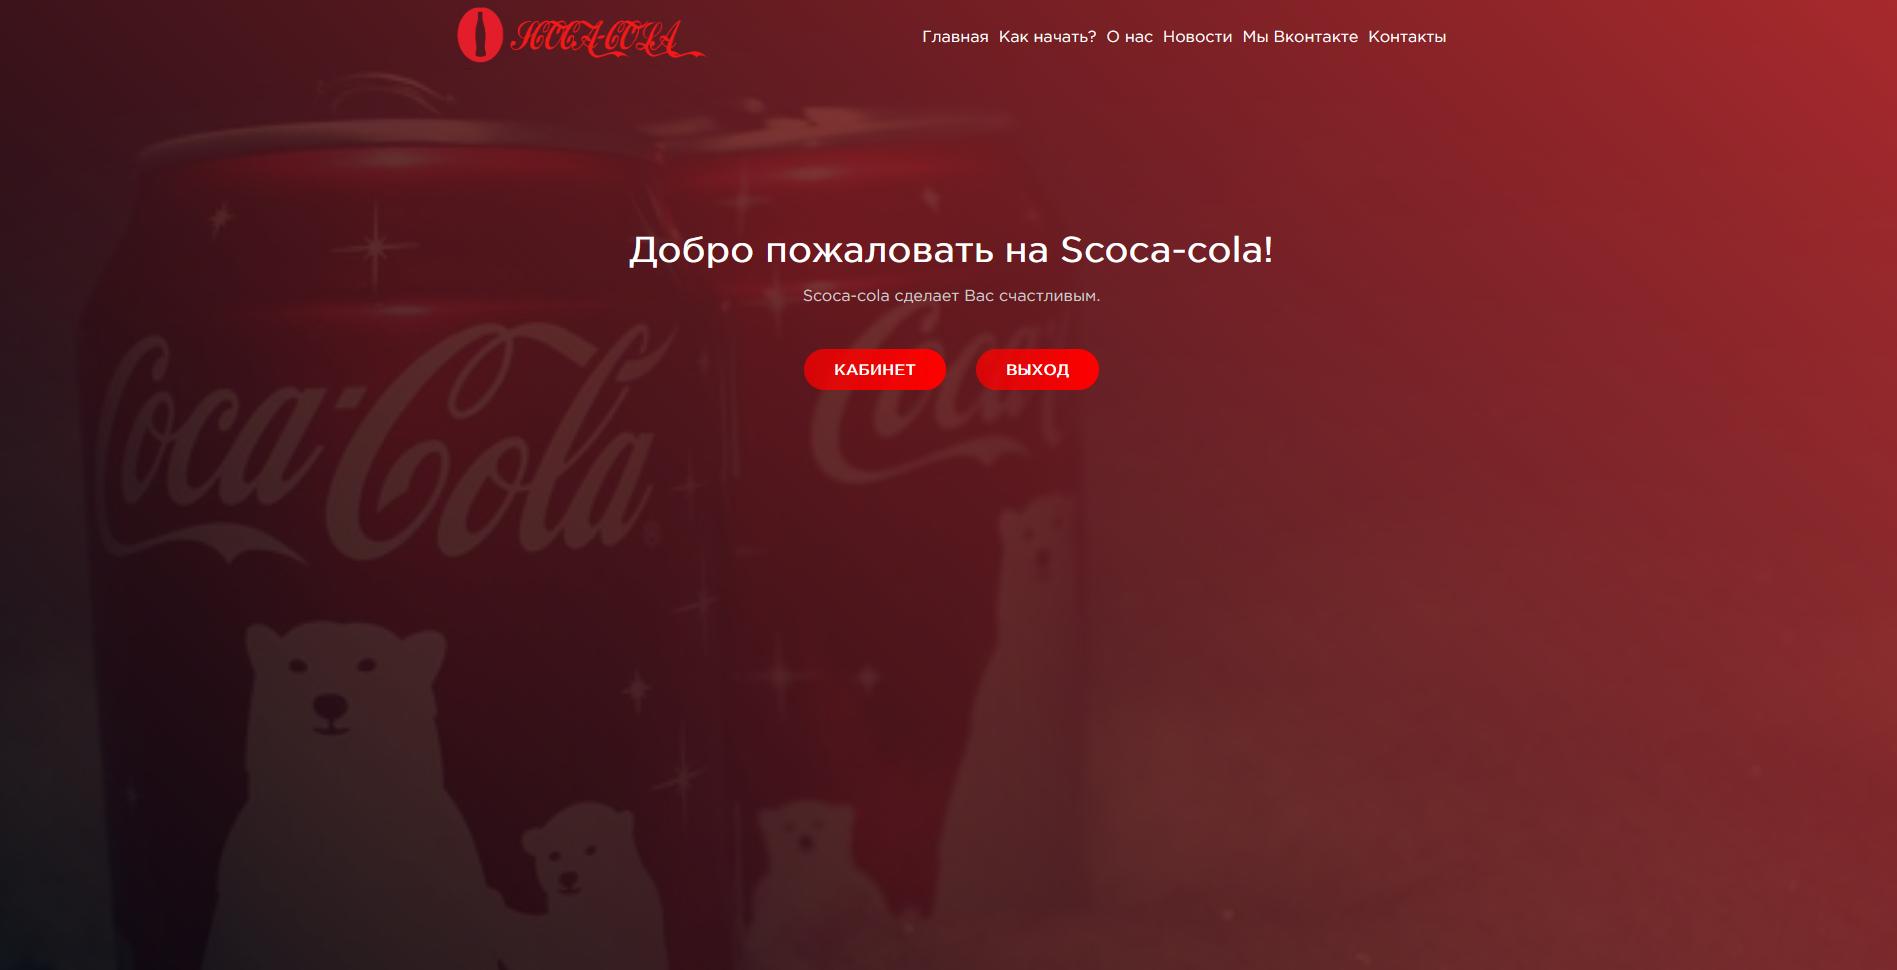 Scoca-cola